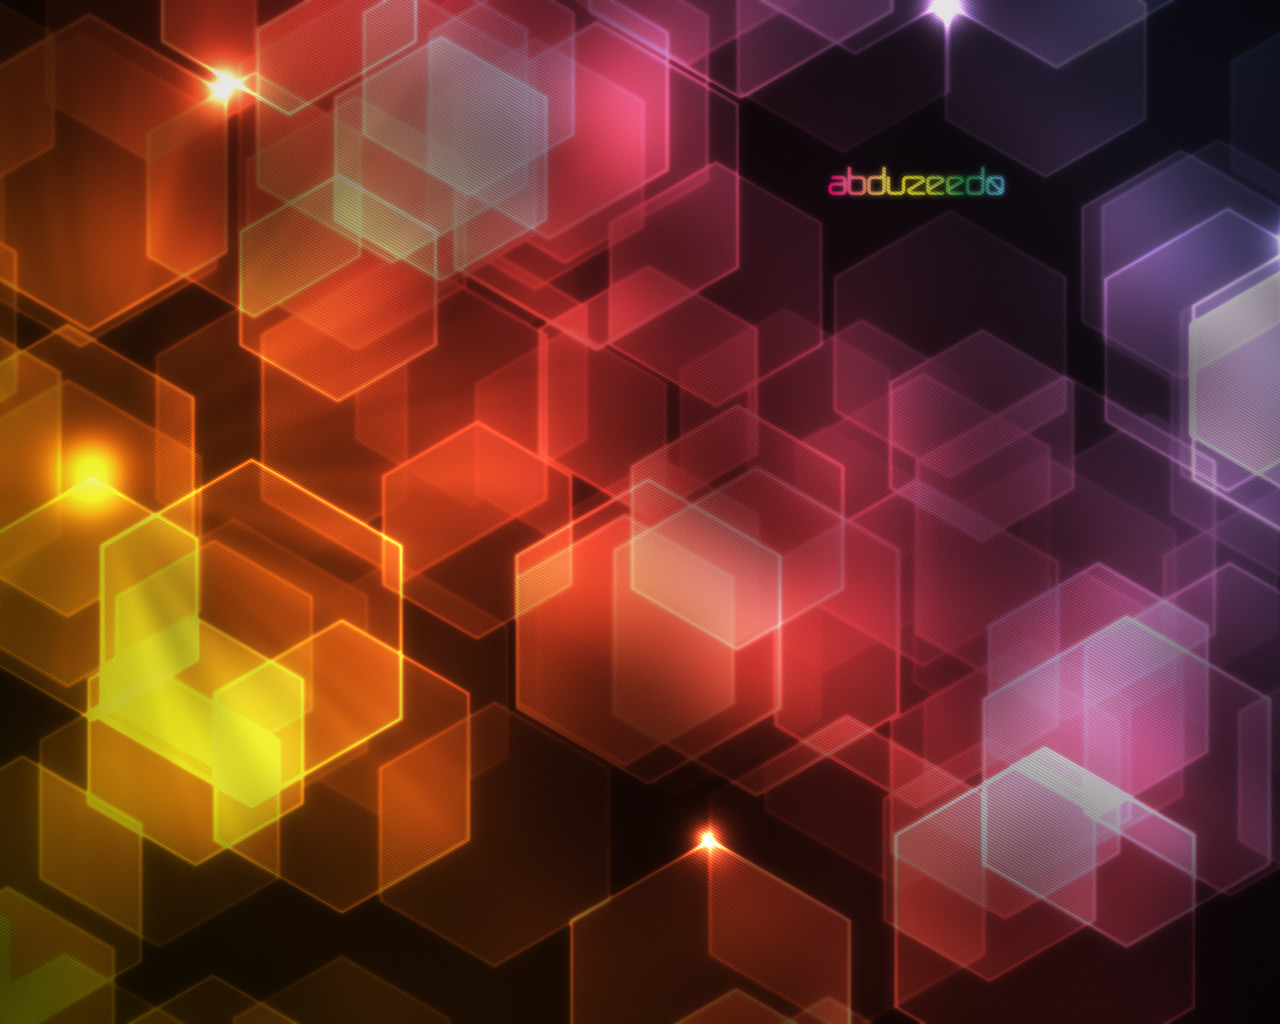 Graphic Design Wallpaper Iphone